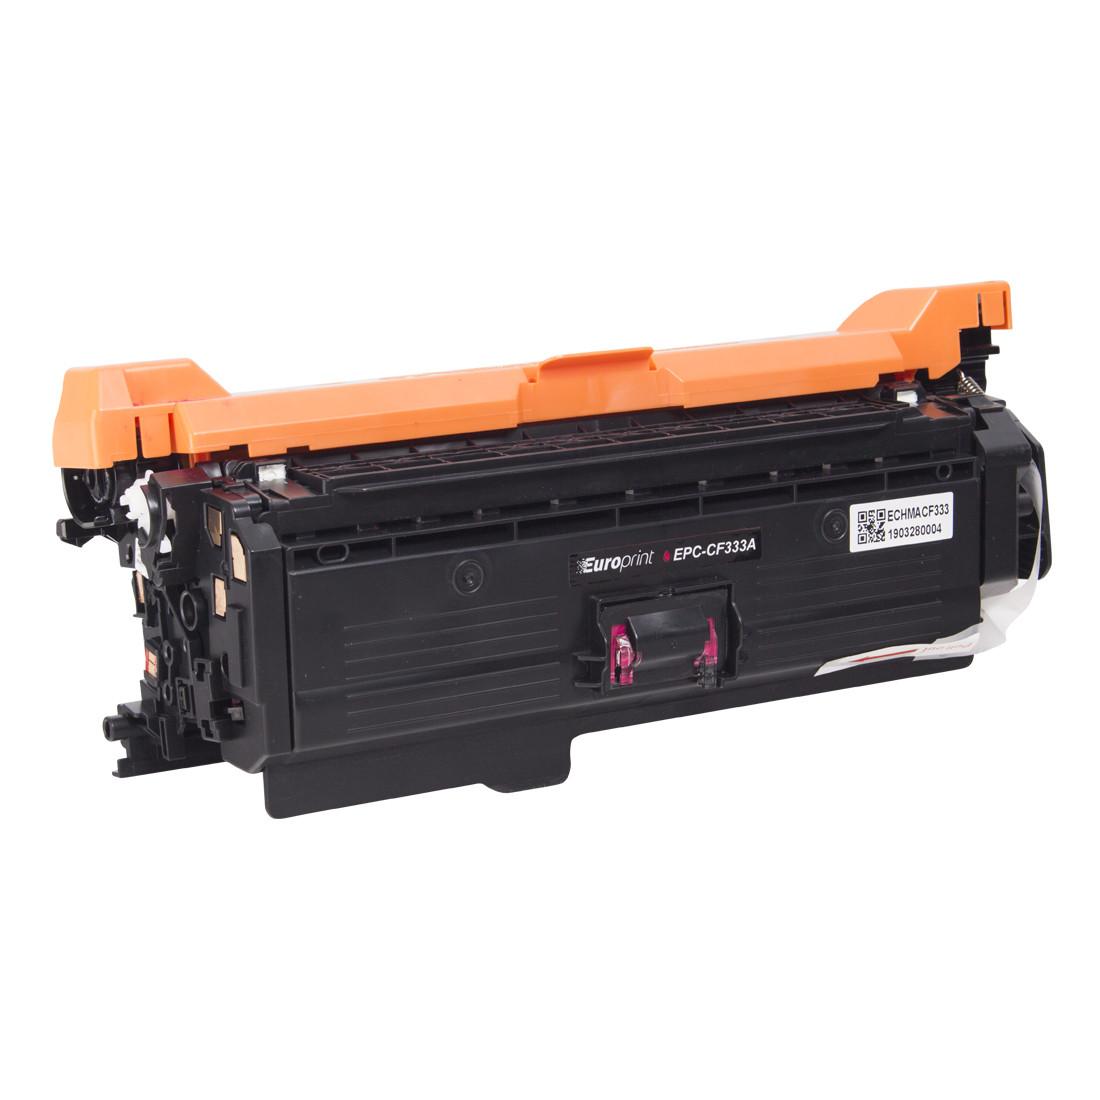 Картридж  Europrint EPC-CF333A  Пурпурный